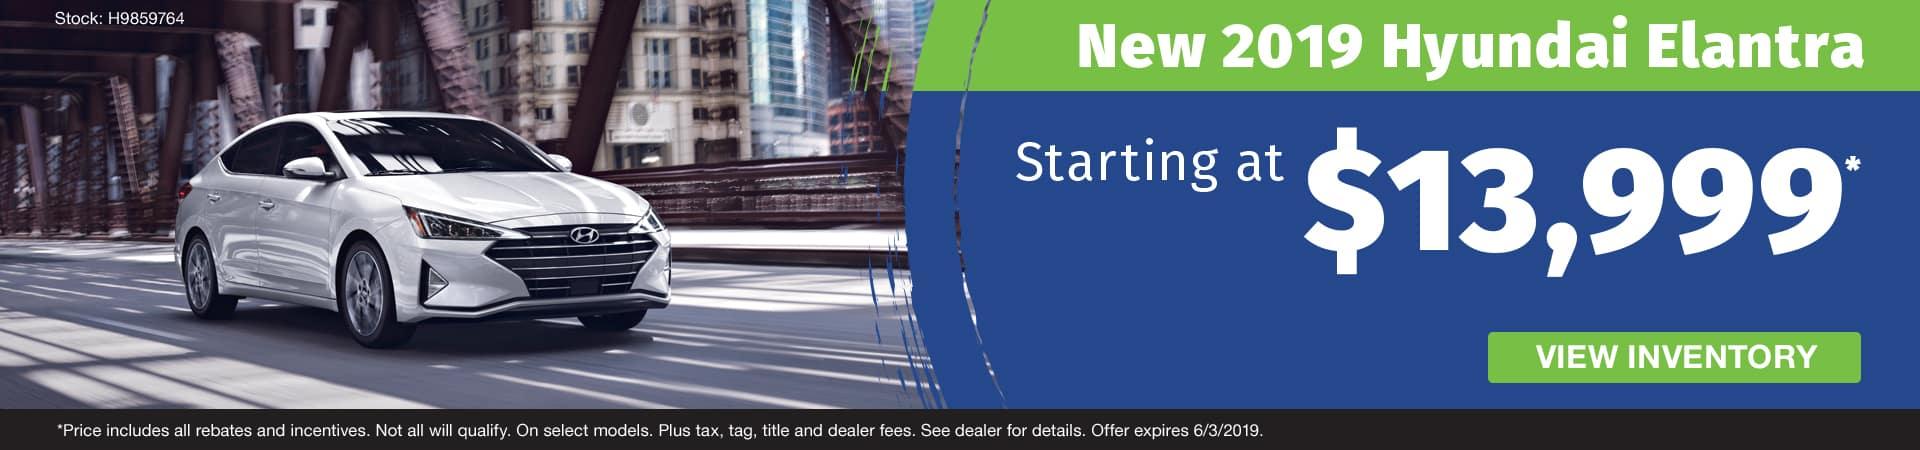 Get a new 2019 Hyundai Elantra starting at $13,999 in Murfreesboro TN